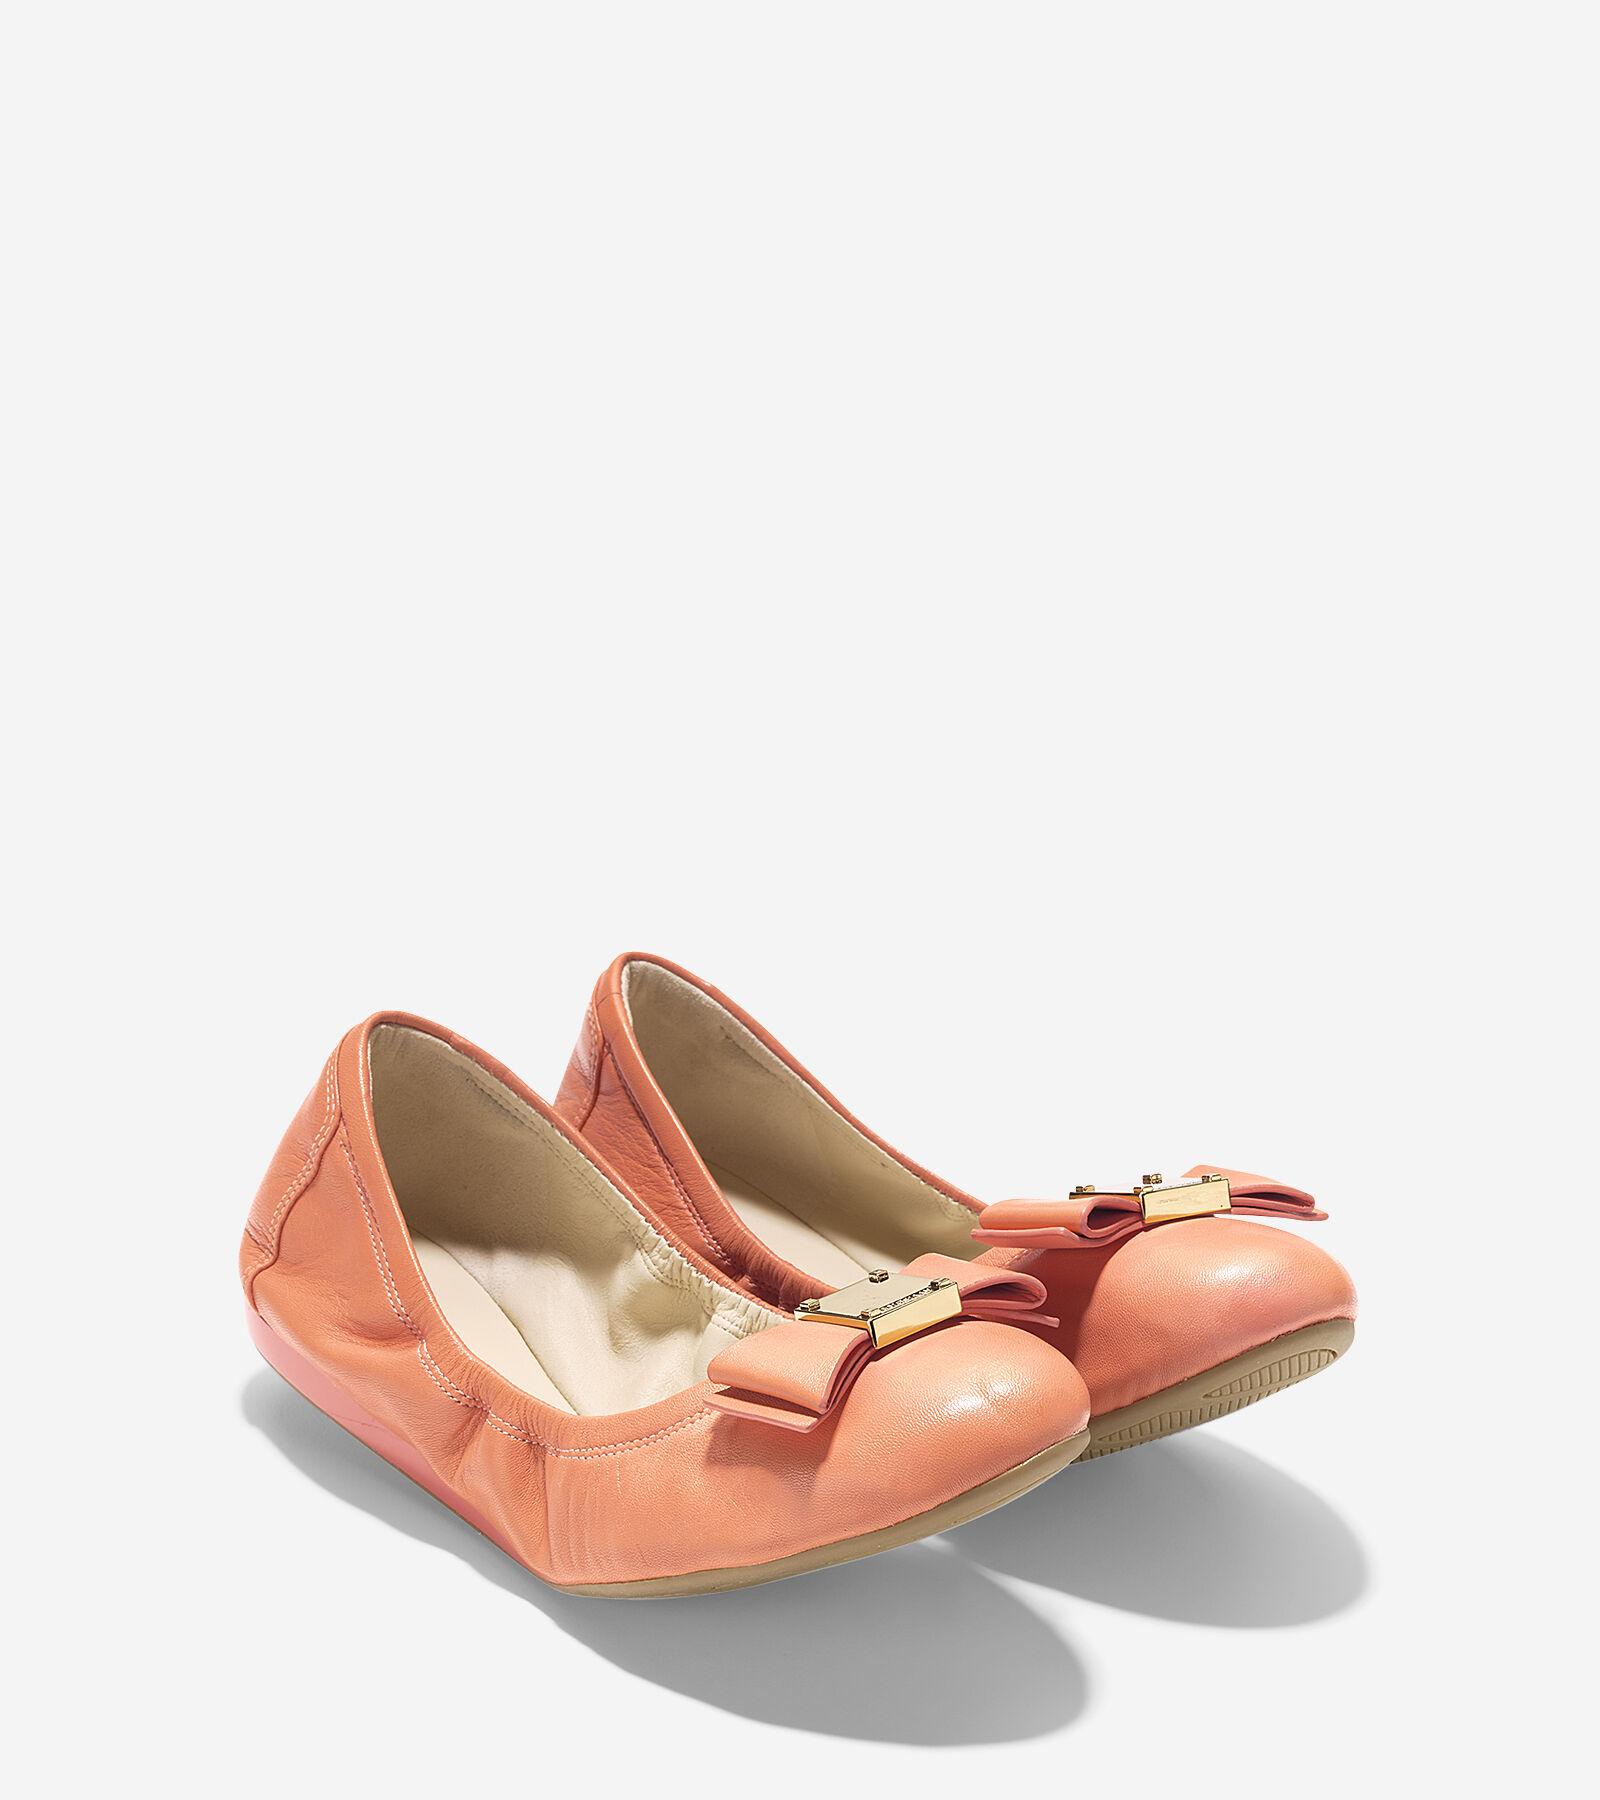 ... Tali Bow Ballet Flat · Tali Bow Ballet Flat. #colehaan